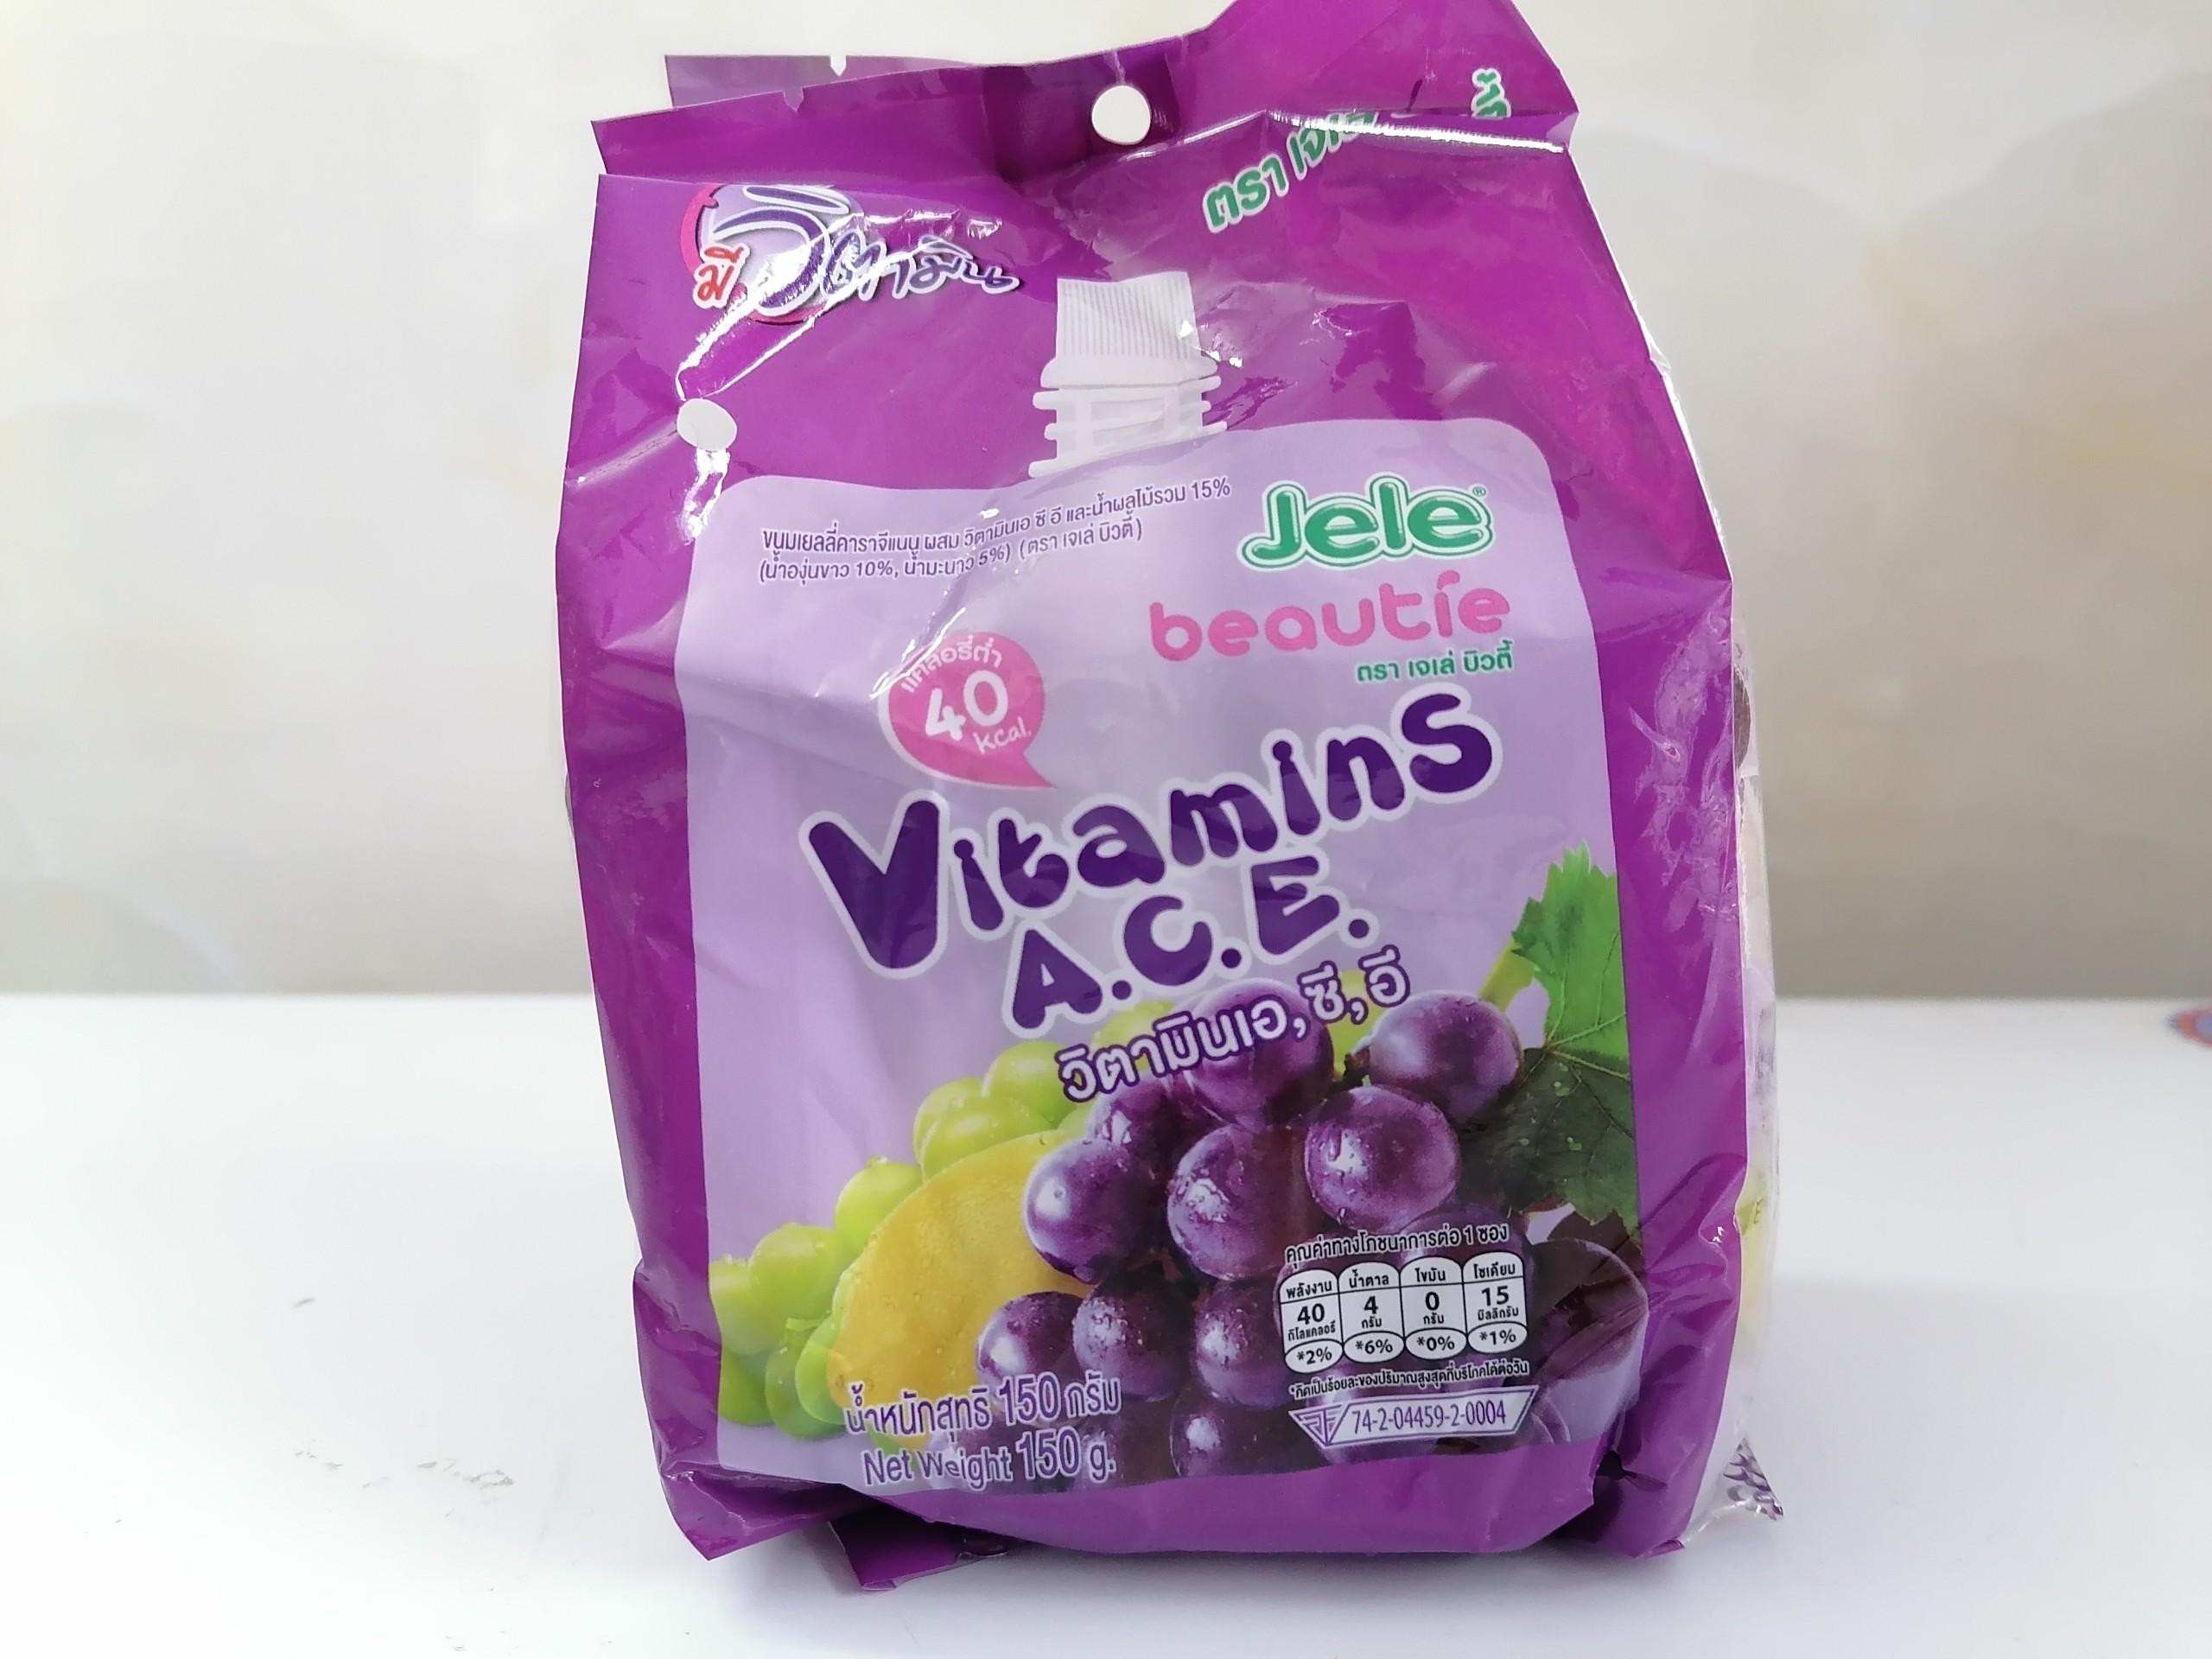 Nước ép trái cây thạch Vitamin A,C,E JEJE BEAUTIE BRAND Jelly Carageenan with Vitamin A, C, E and 15% Mixed Fruit Juice 150g x3 (halal)